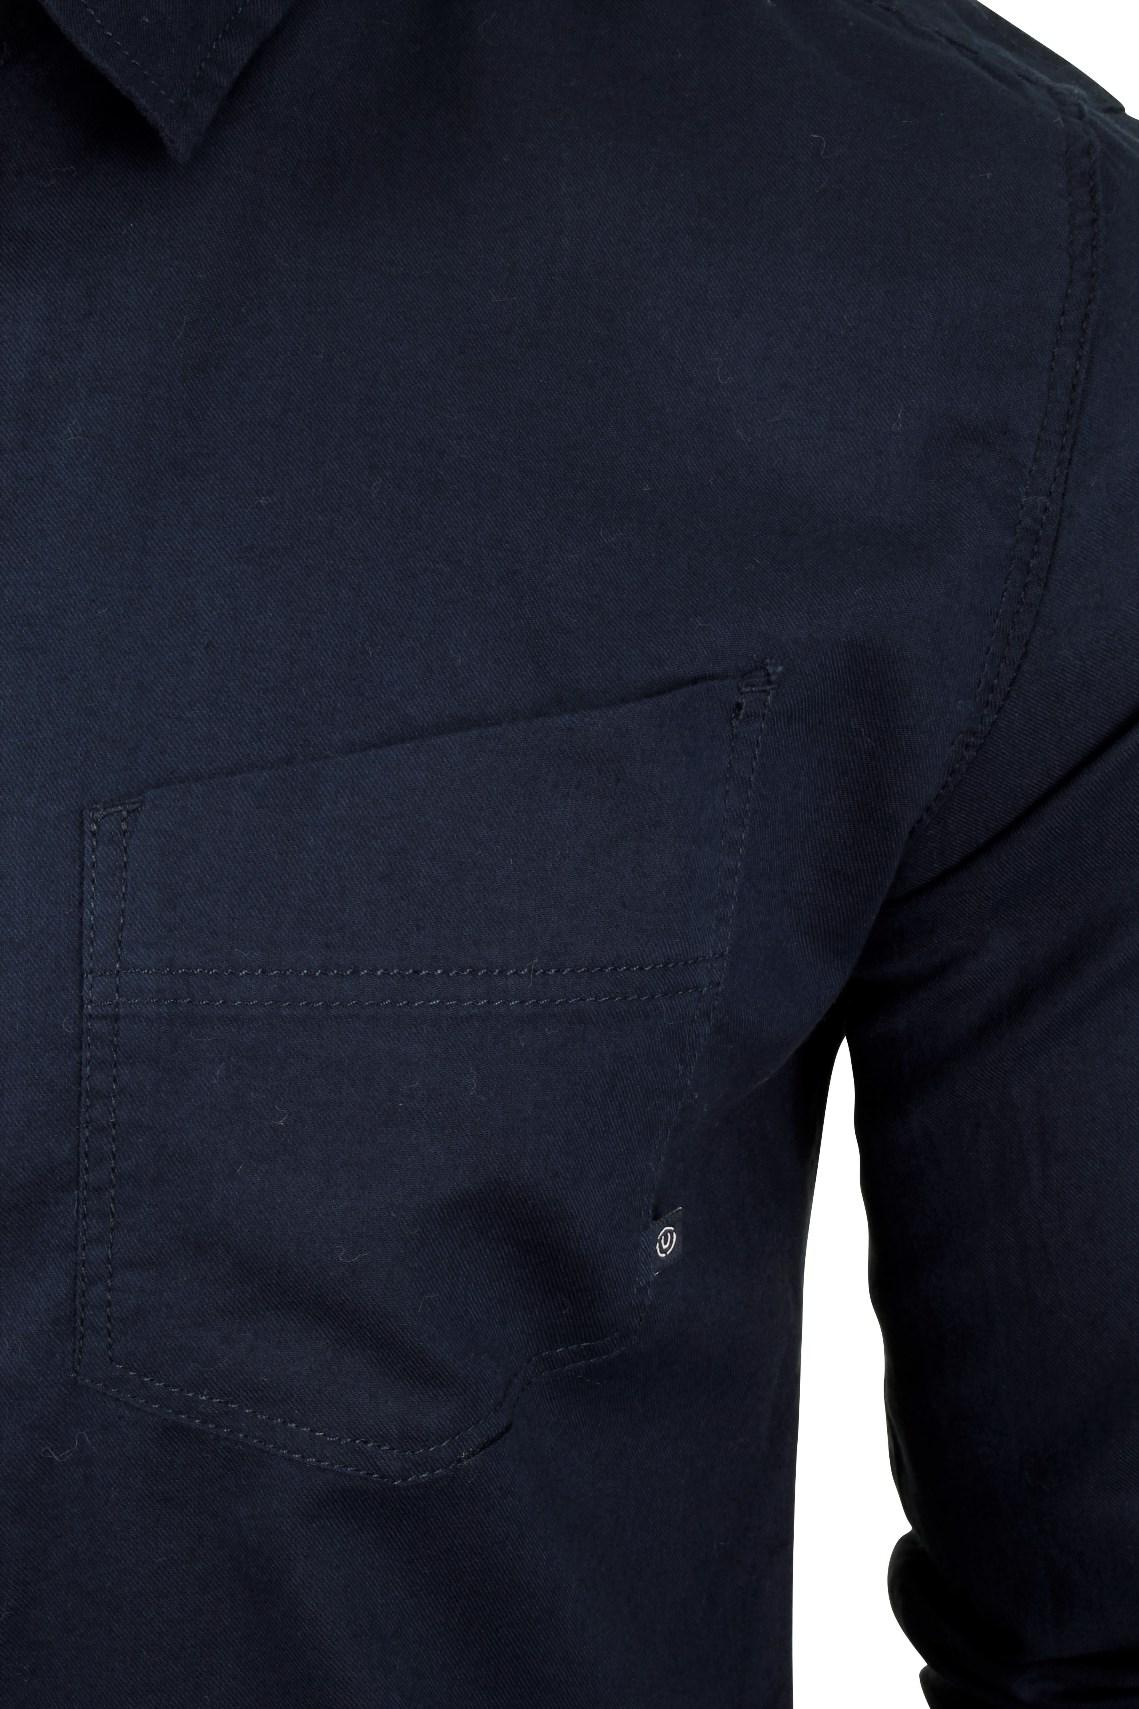 Para-Hombre-Franela-Camisa-por-Pato-Y-Cubierta-039-Katlego-039-Manga-Larga miniatura 10